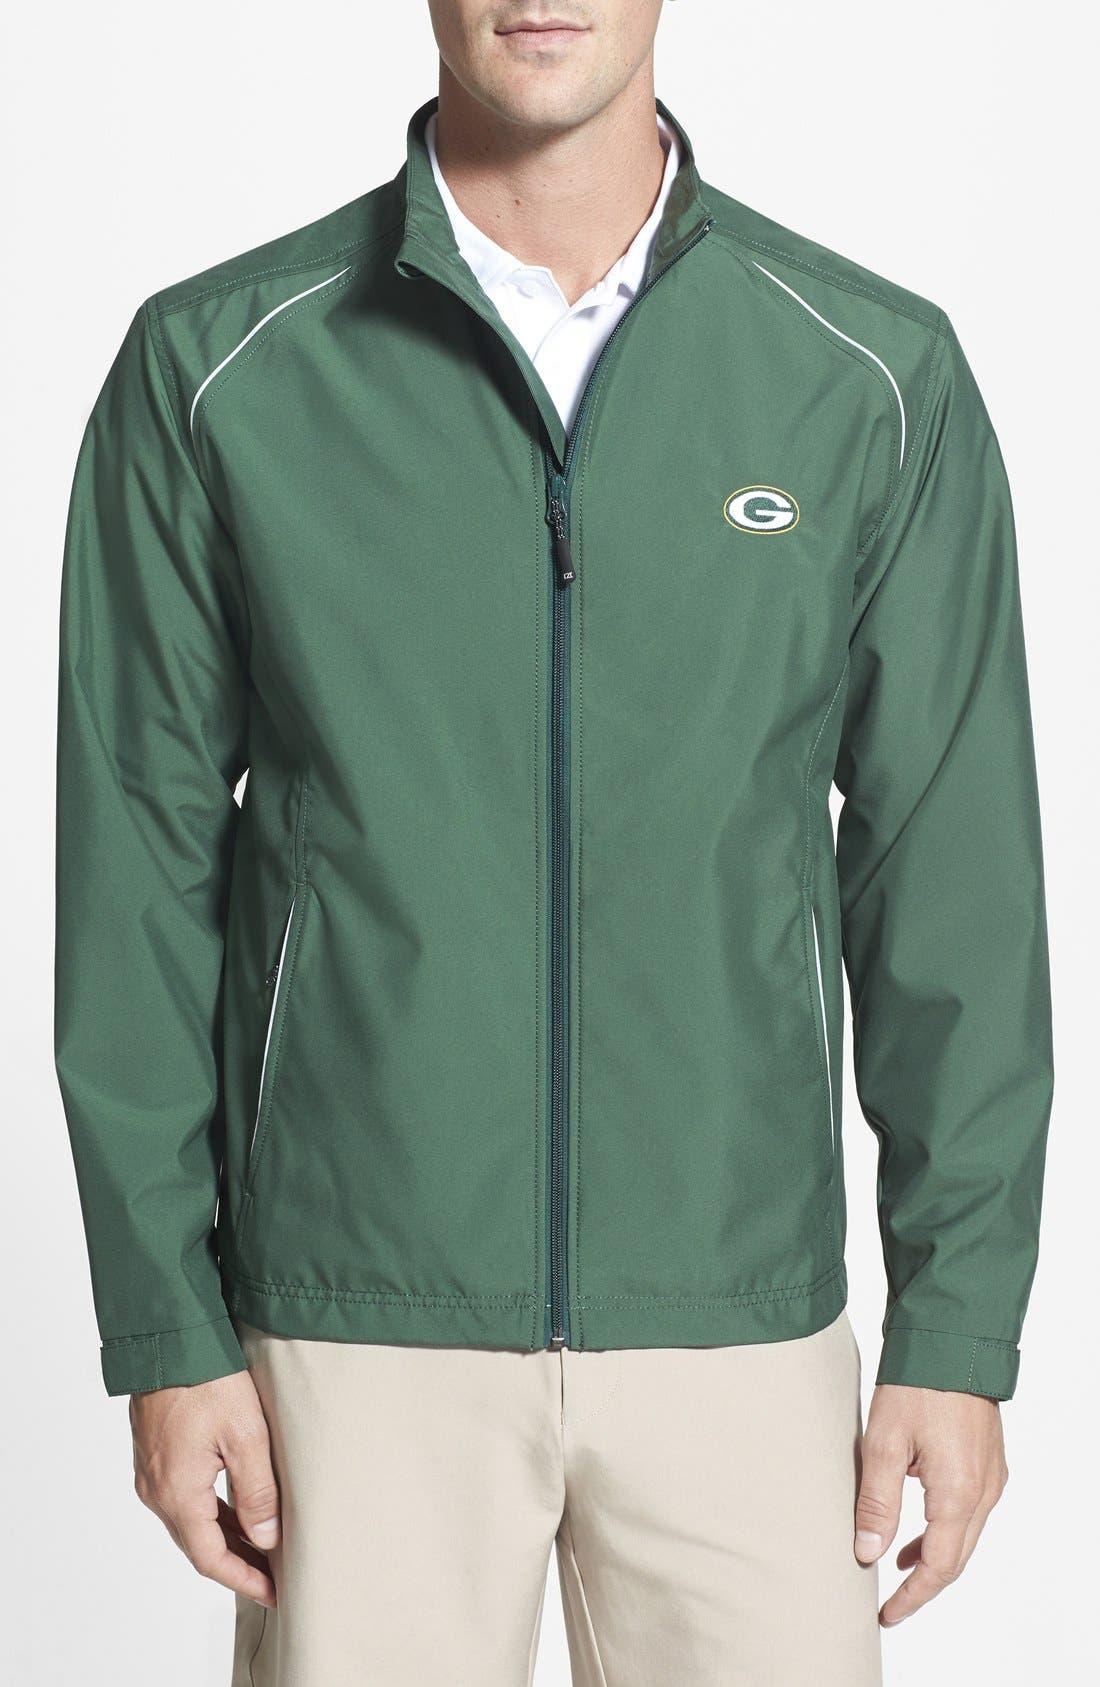 Cutter & Buck Green Bay Packers - Beacon WeatherTec Wind & Water Resistant Jacket